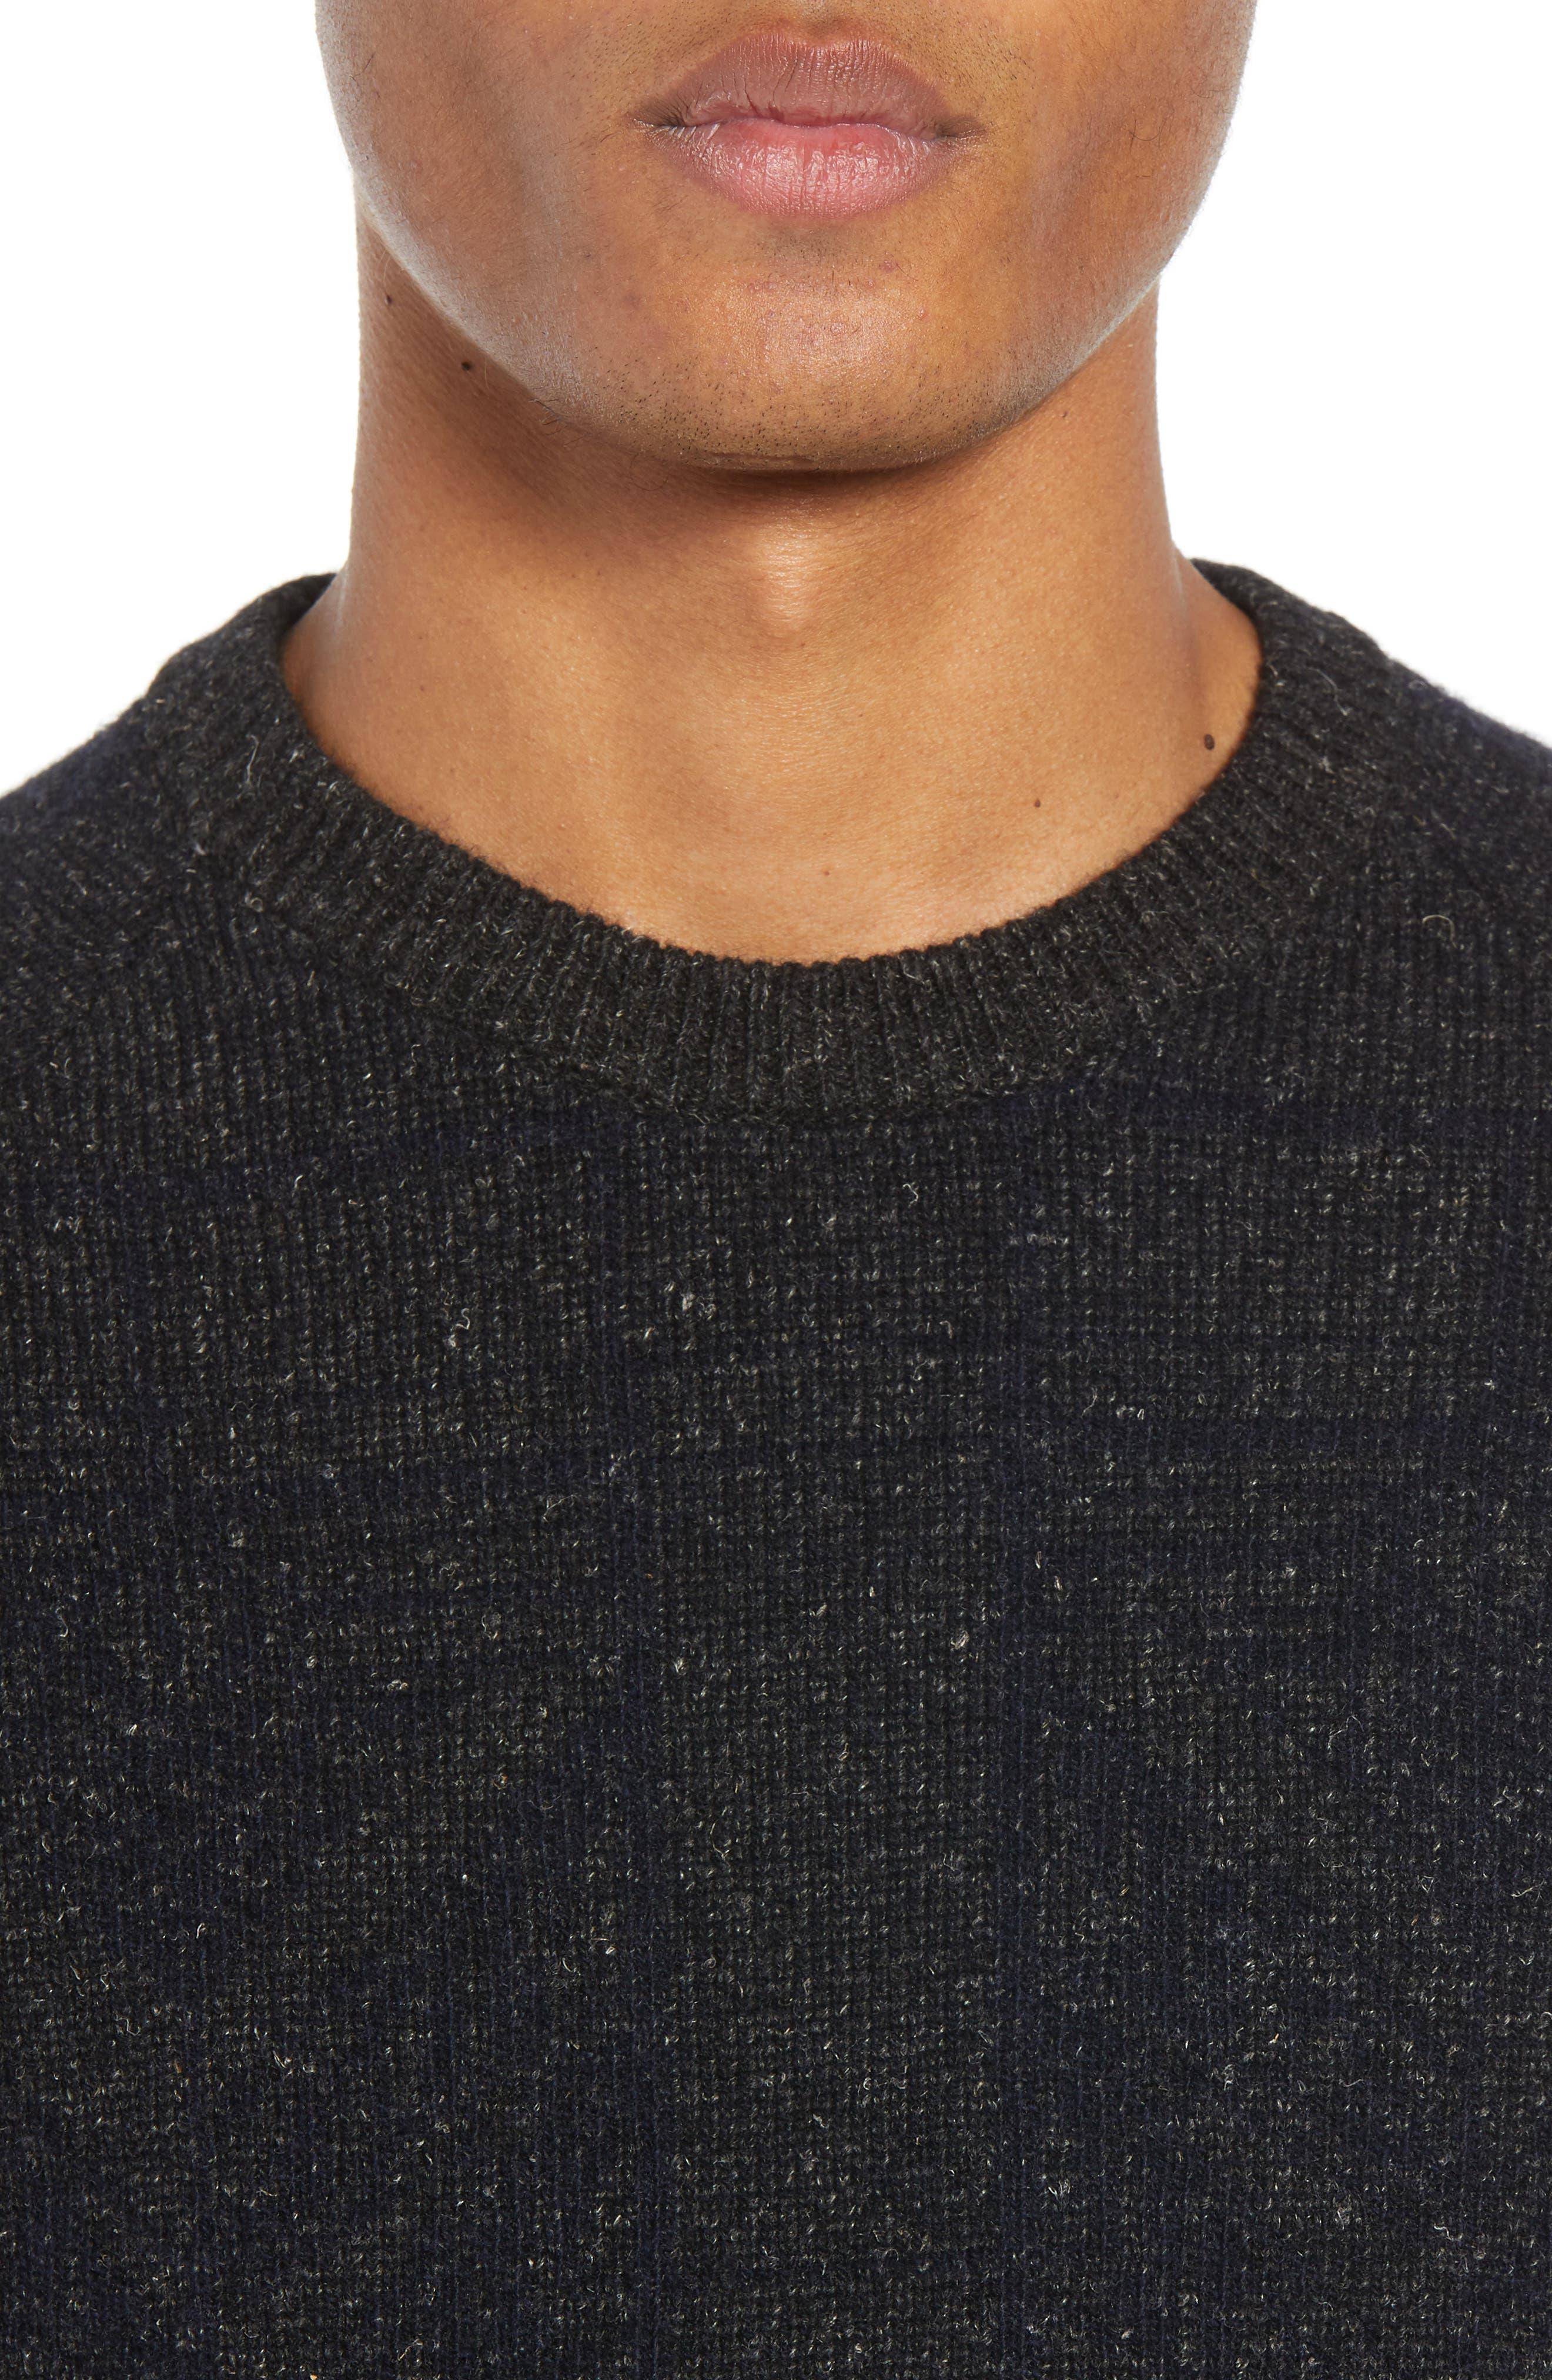 Regular Fit Crewneck Sweater,                             Alternate thumbnail 4, color,                             CHARCOAL